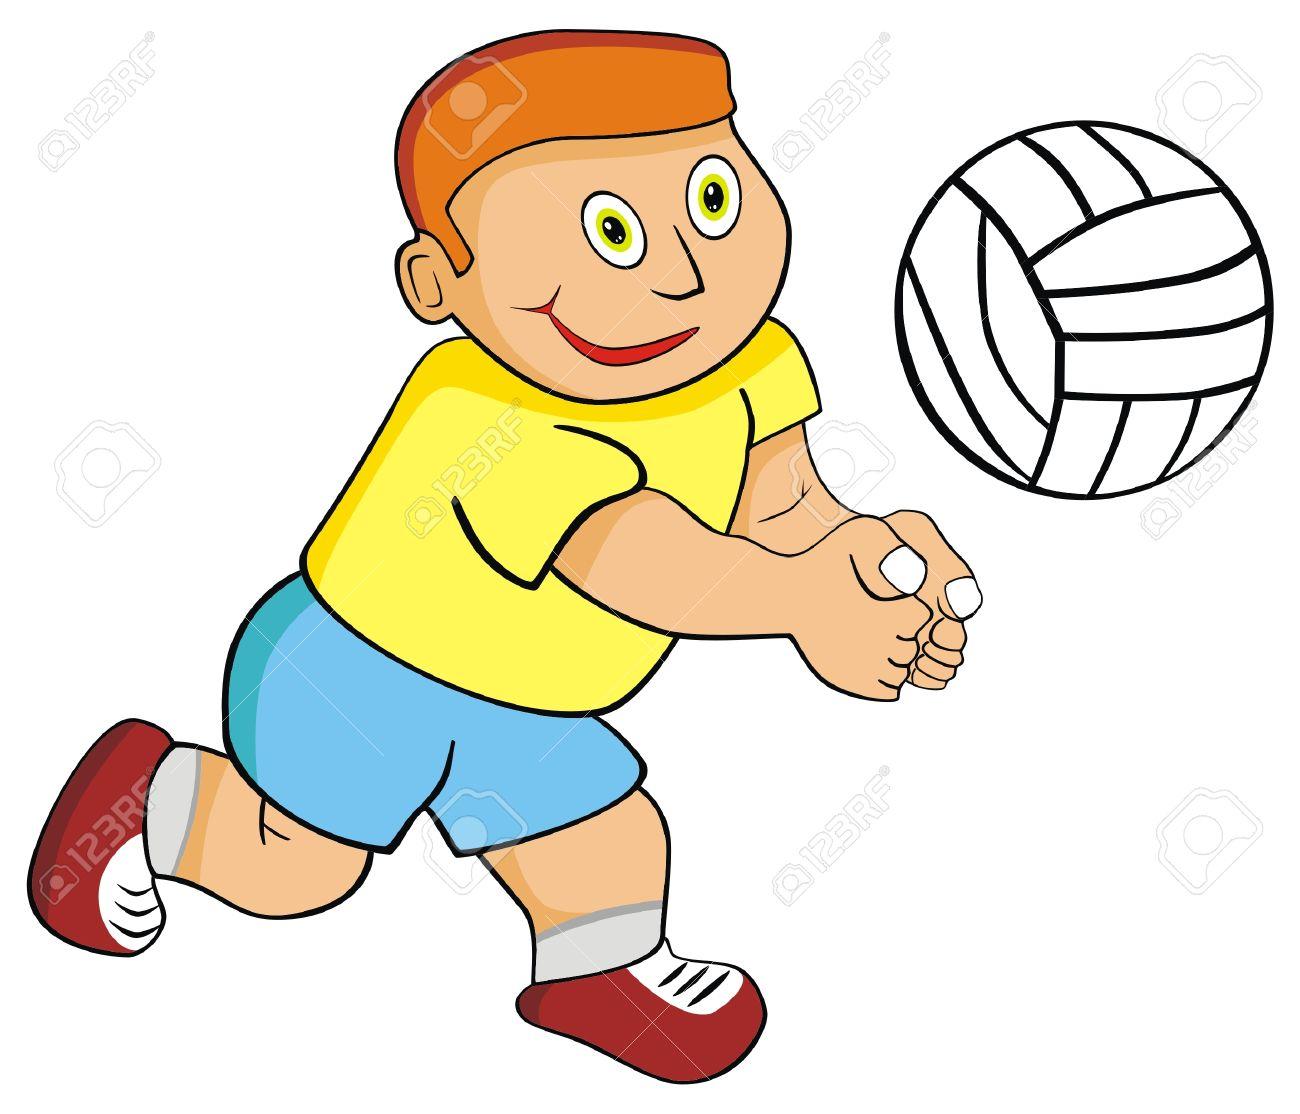 Playing volleyball clipart jpg transparent stock Kids playing volleyball clipart » Clipart Station jpg transparent stock